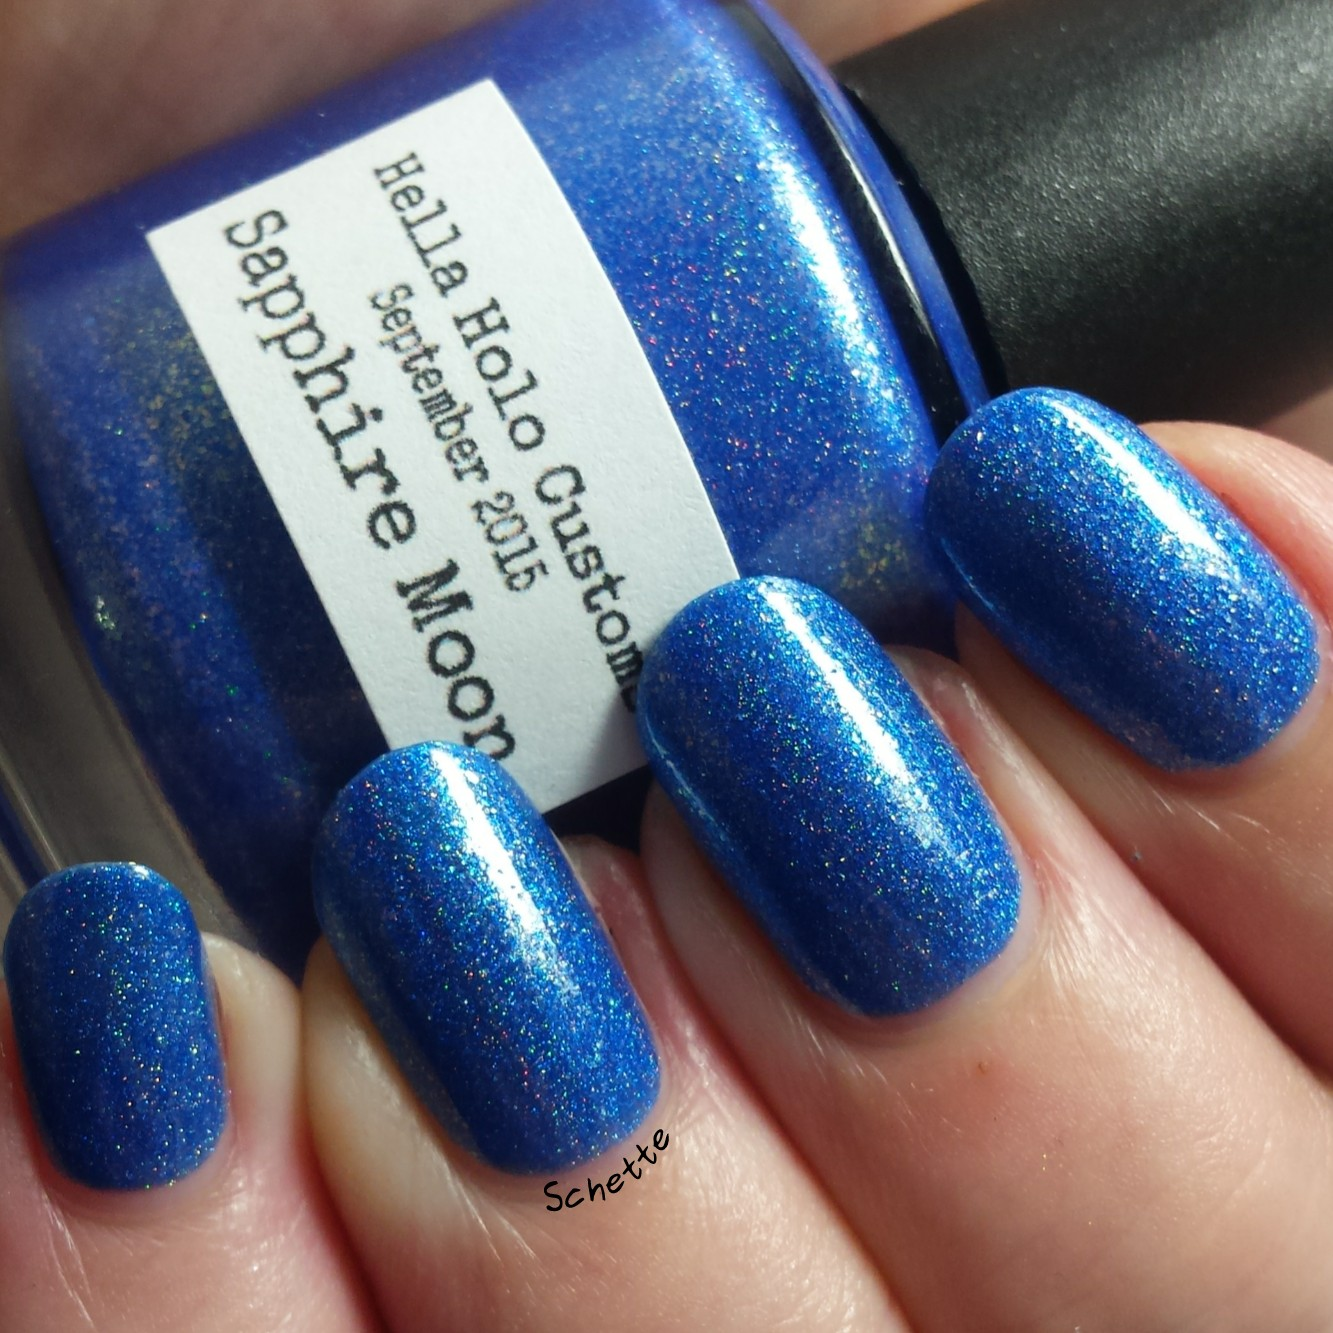 Vapid Lacquer - Sapphire Moon